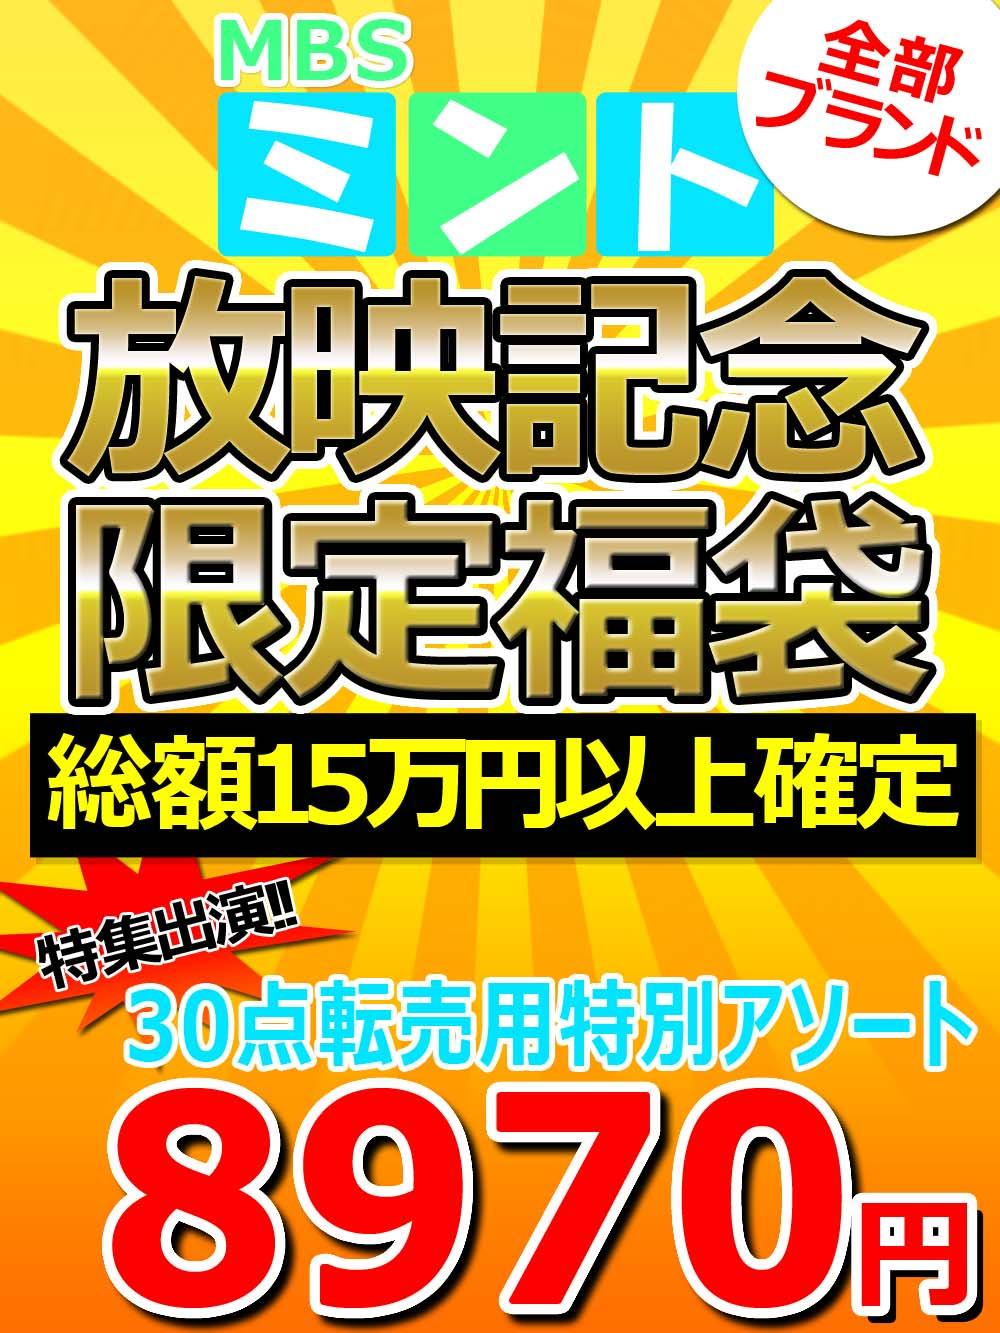 【MBS放送ミント出演!】放映記念特別福袋 総額15万円以上確定!転売用アソート【30点】8970